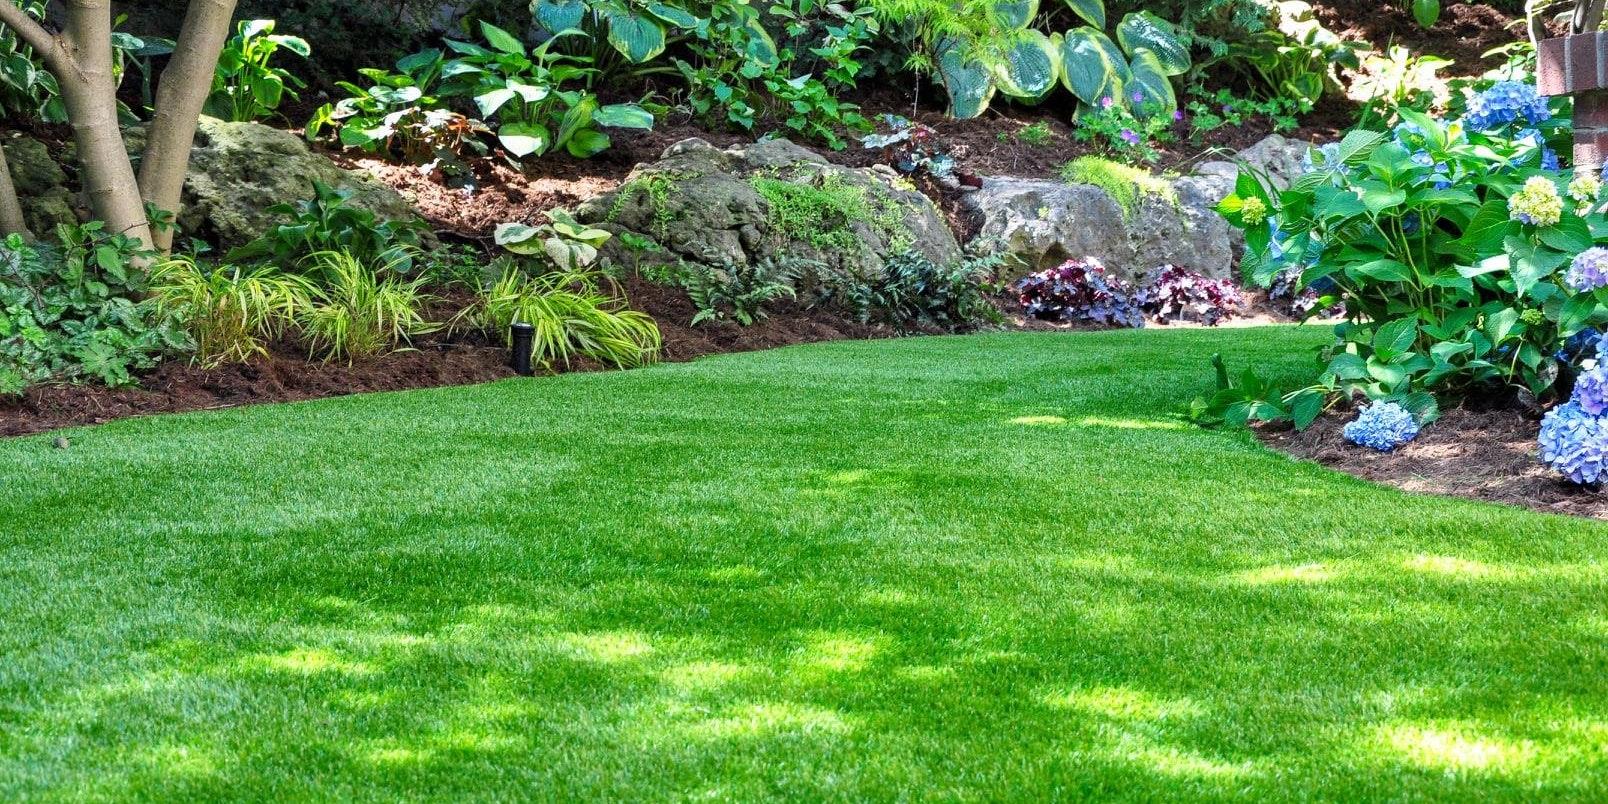 Washington Tree & Lawn Care